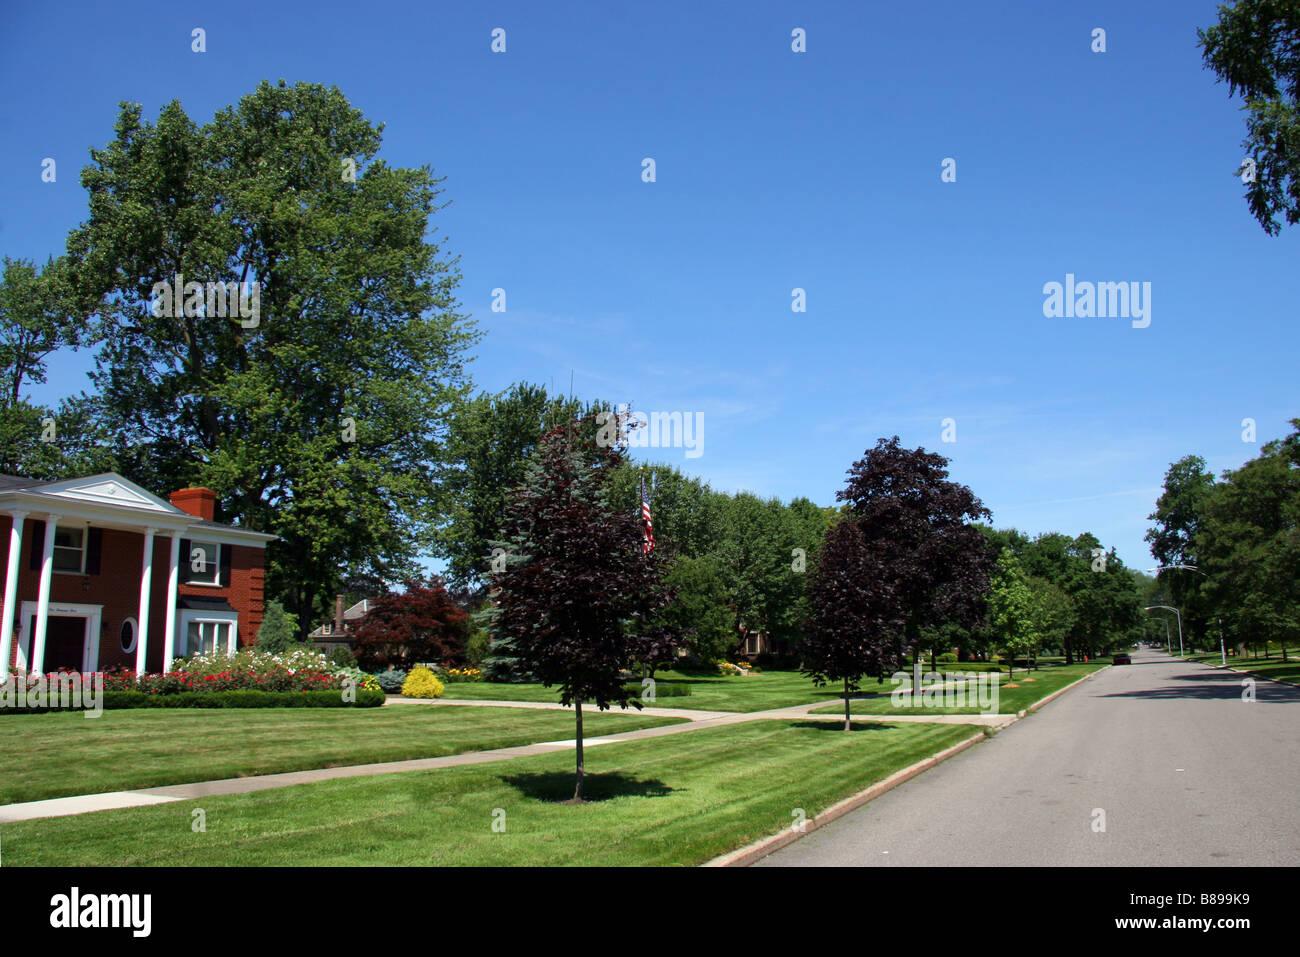 Green street in an affluent neigbourhood of Grosse Pointe Michigan USA - Stock Image